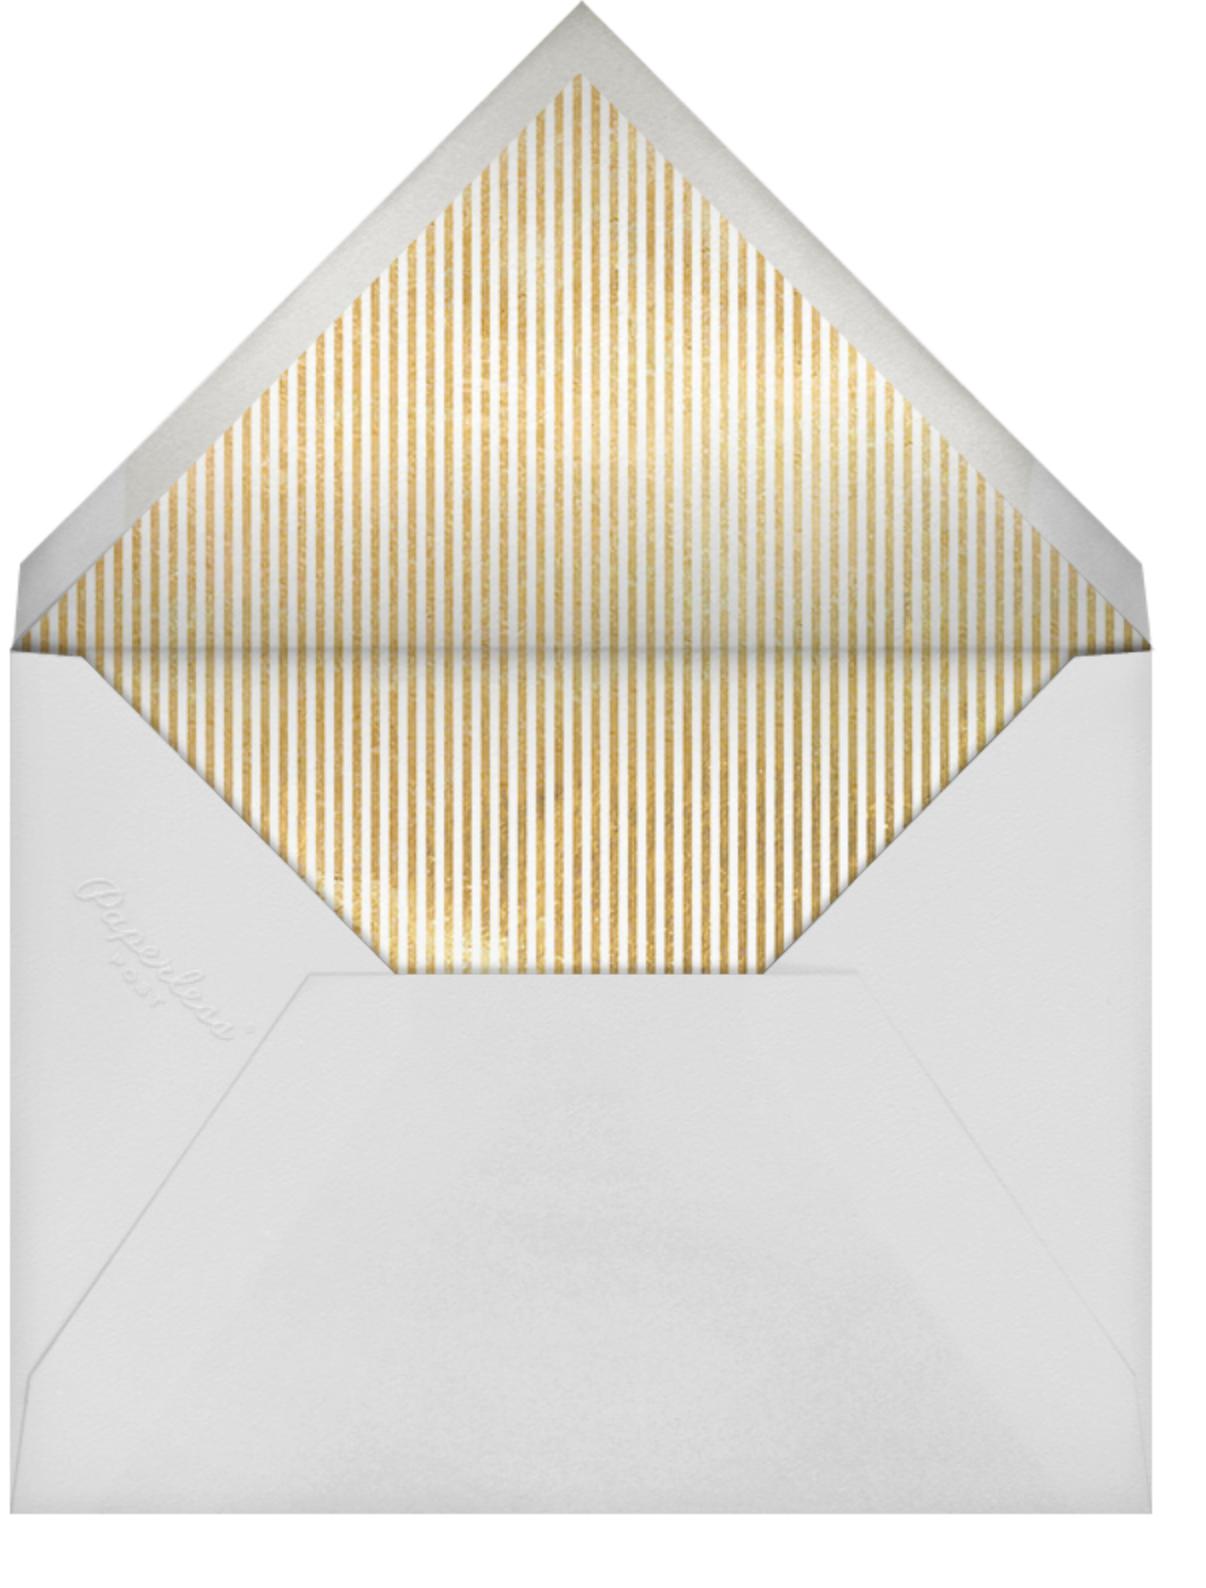 Milestone Dots (Eighty) - Gray - Sugar Paper - Adult birthday - envelope back